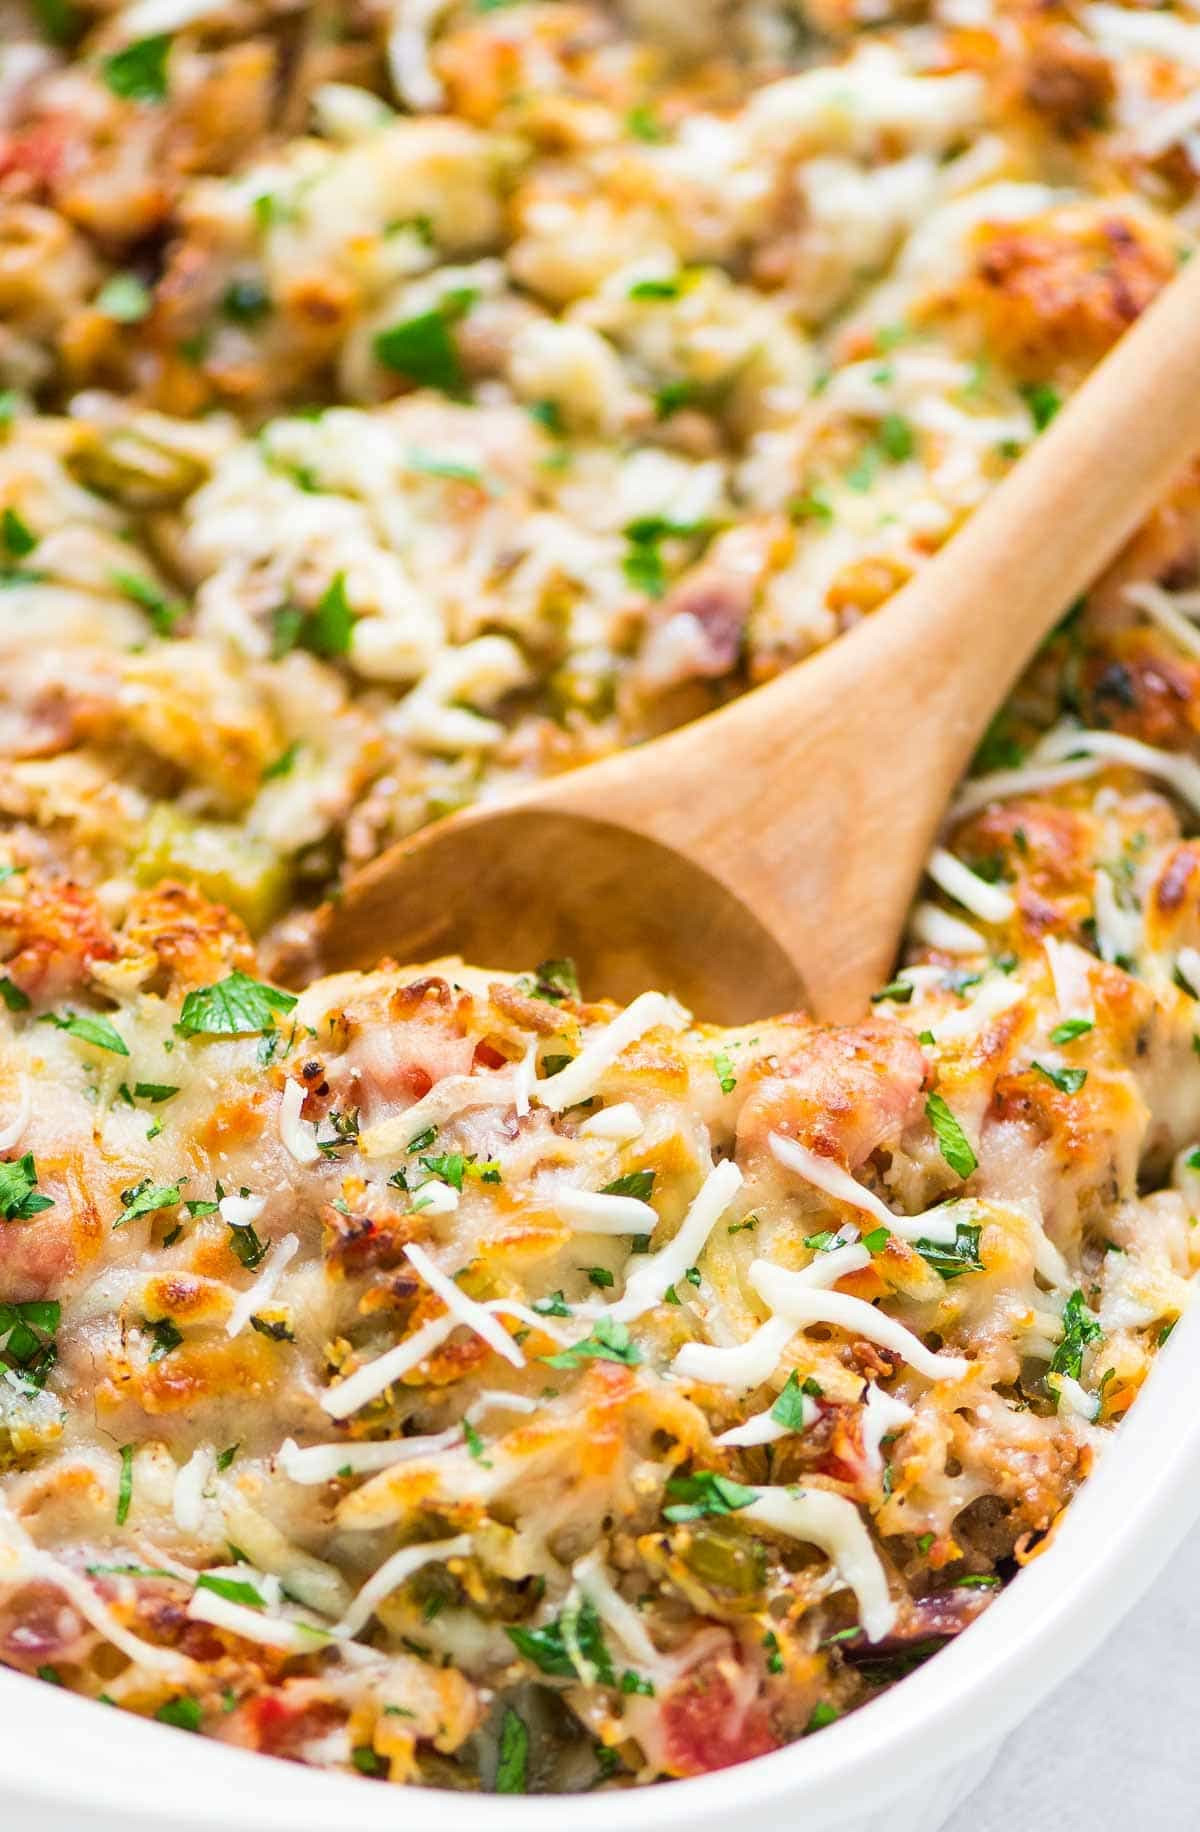 Spaghetti Squash Healthy  Healthy Spaghetti Squash Casserole